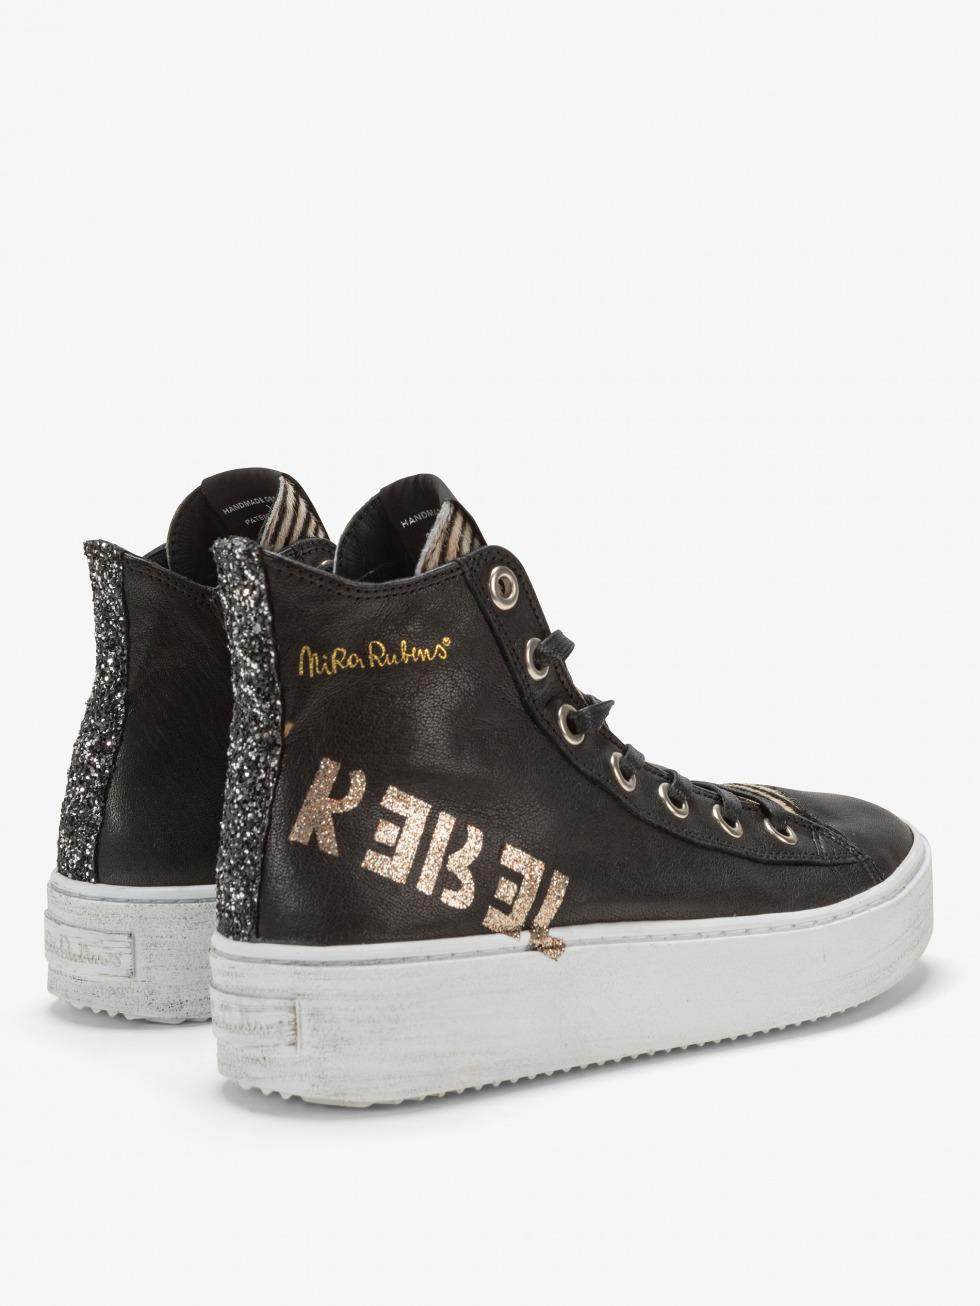 sneakers-long-island-rebel-black-zebrina-glitter-3